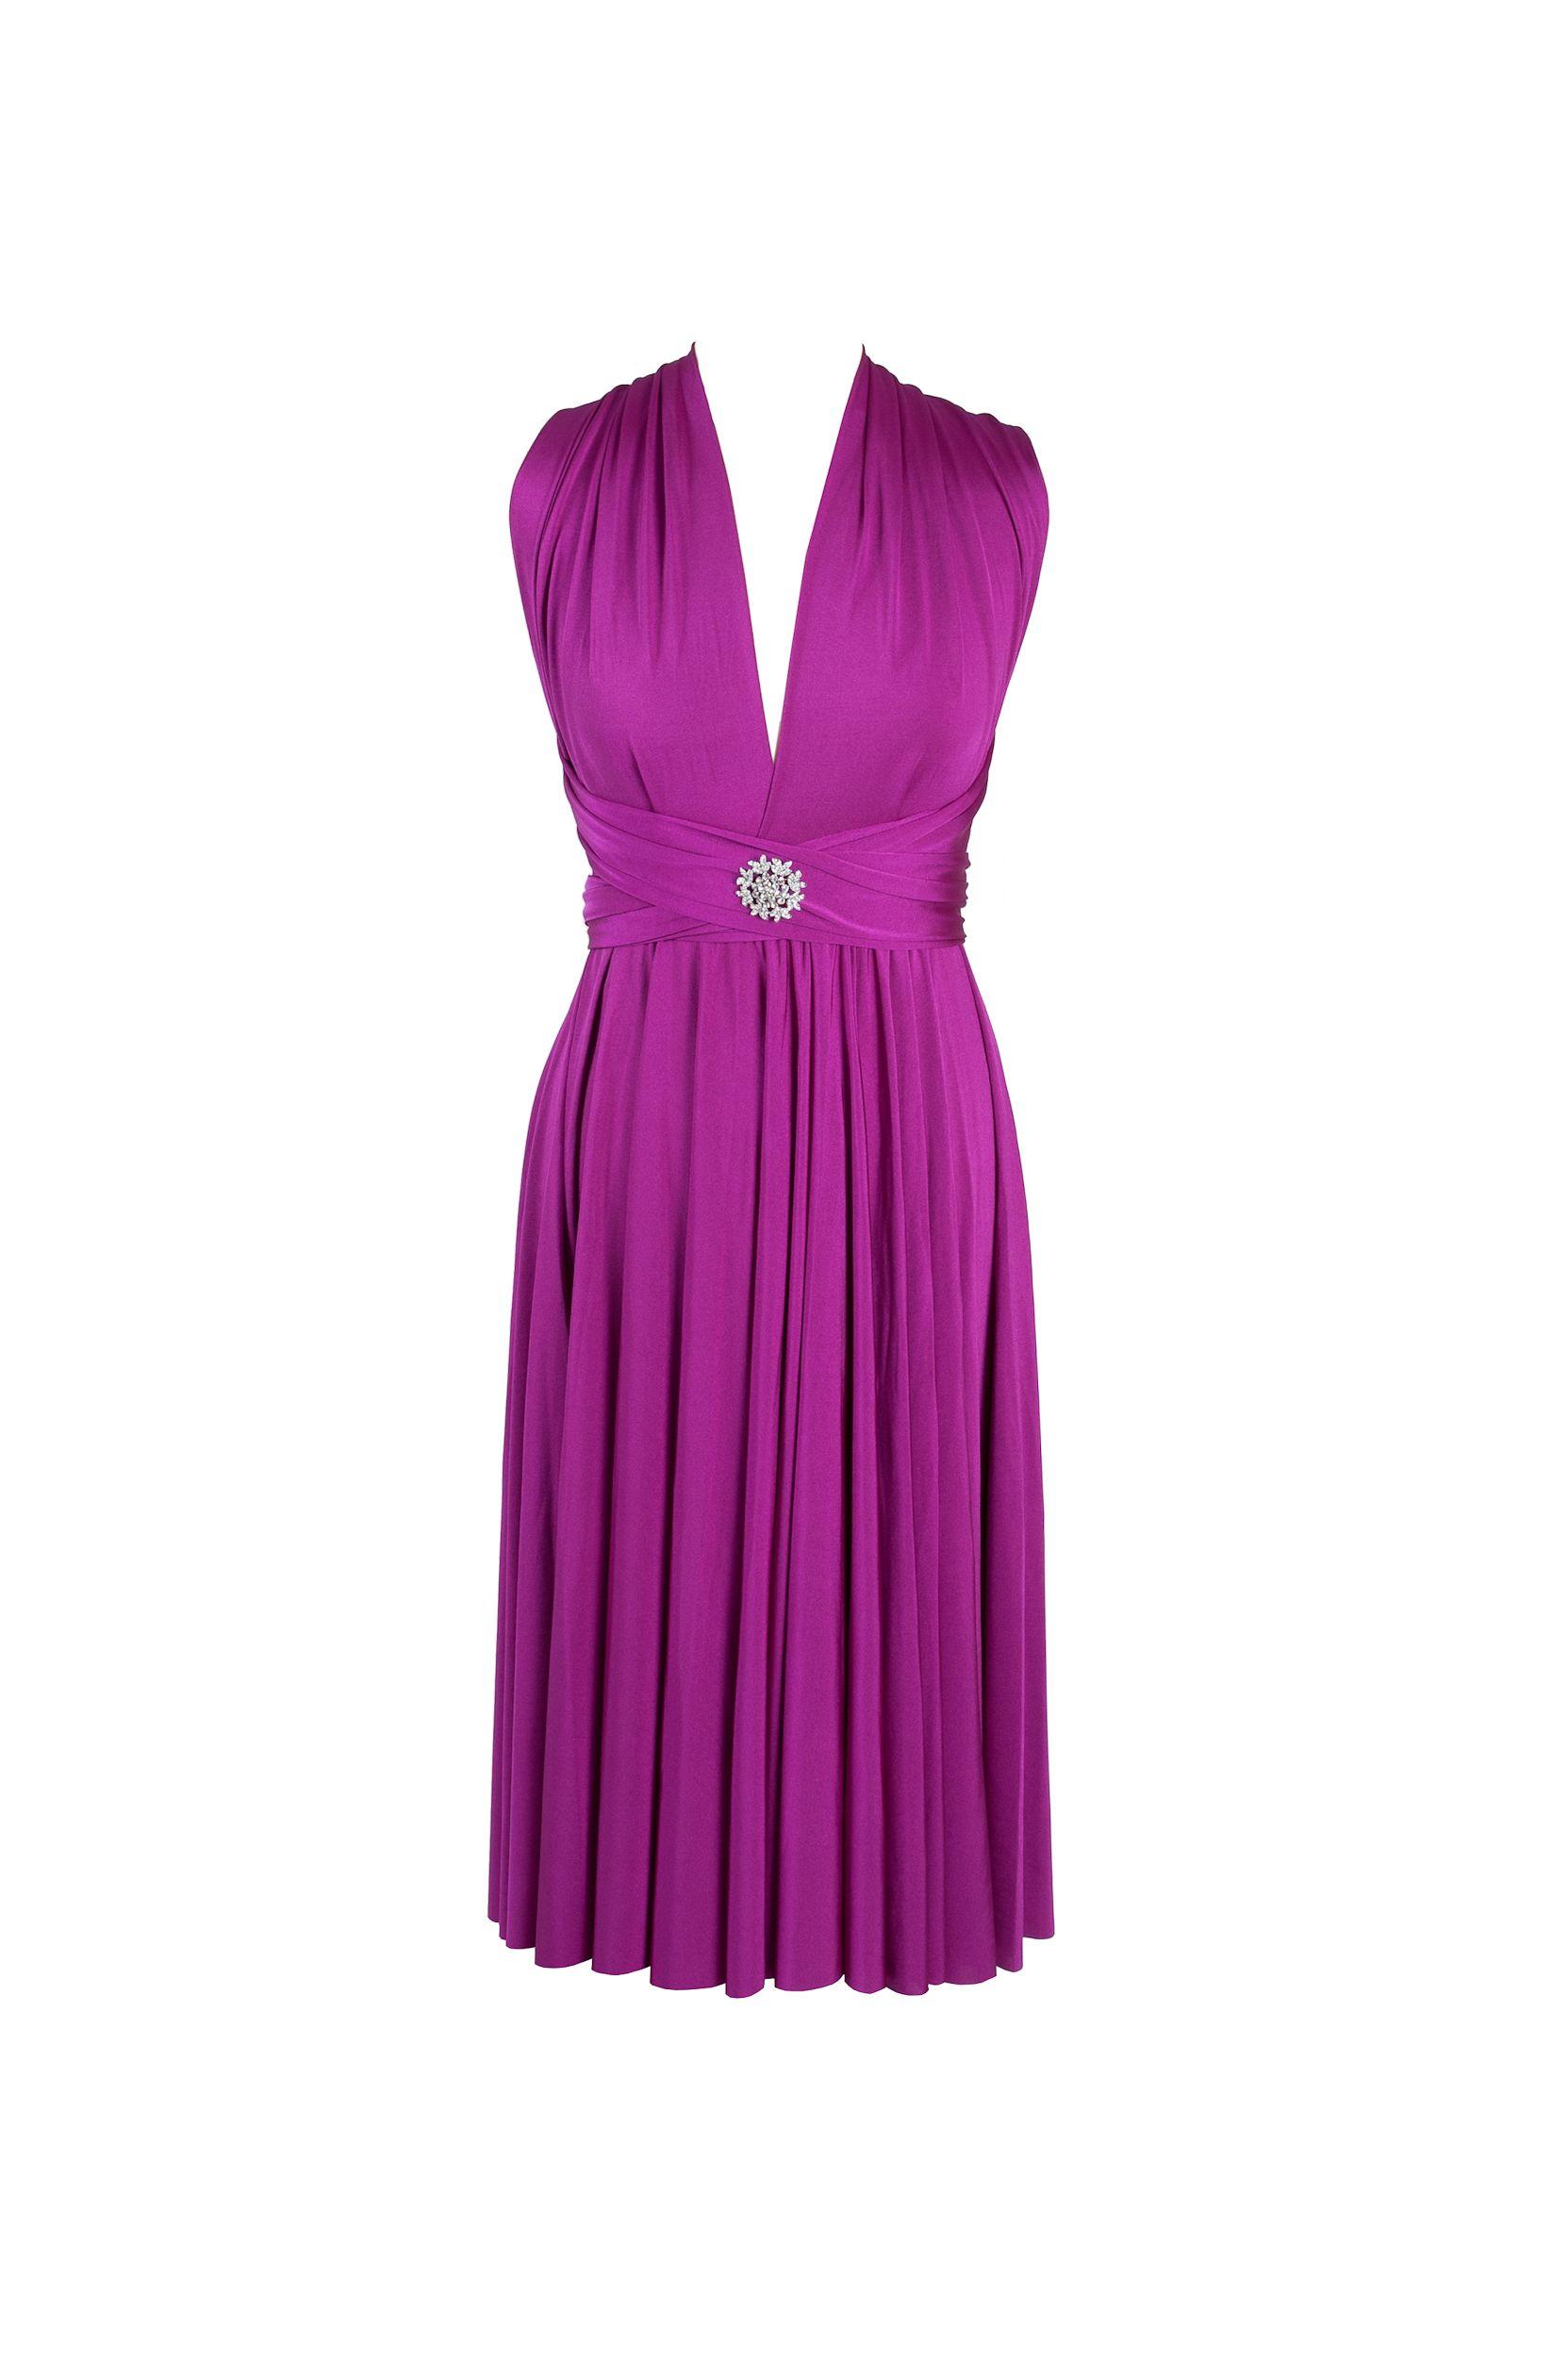 Magenta dress by twobirds Bridesmaid   Weddings   Pinterest